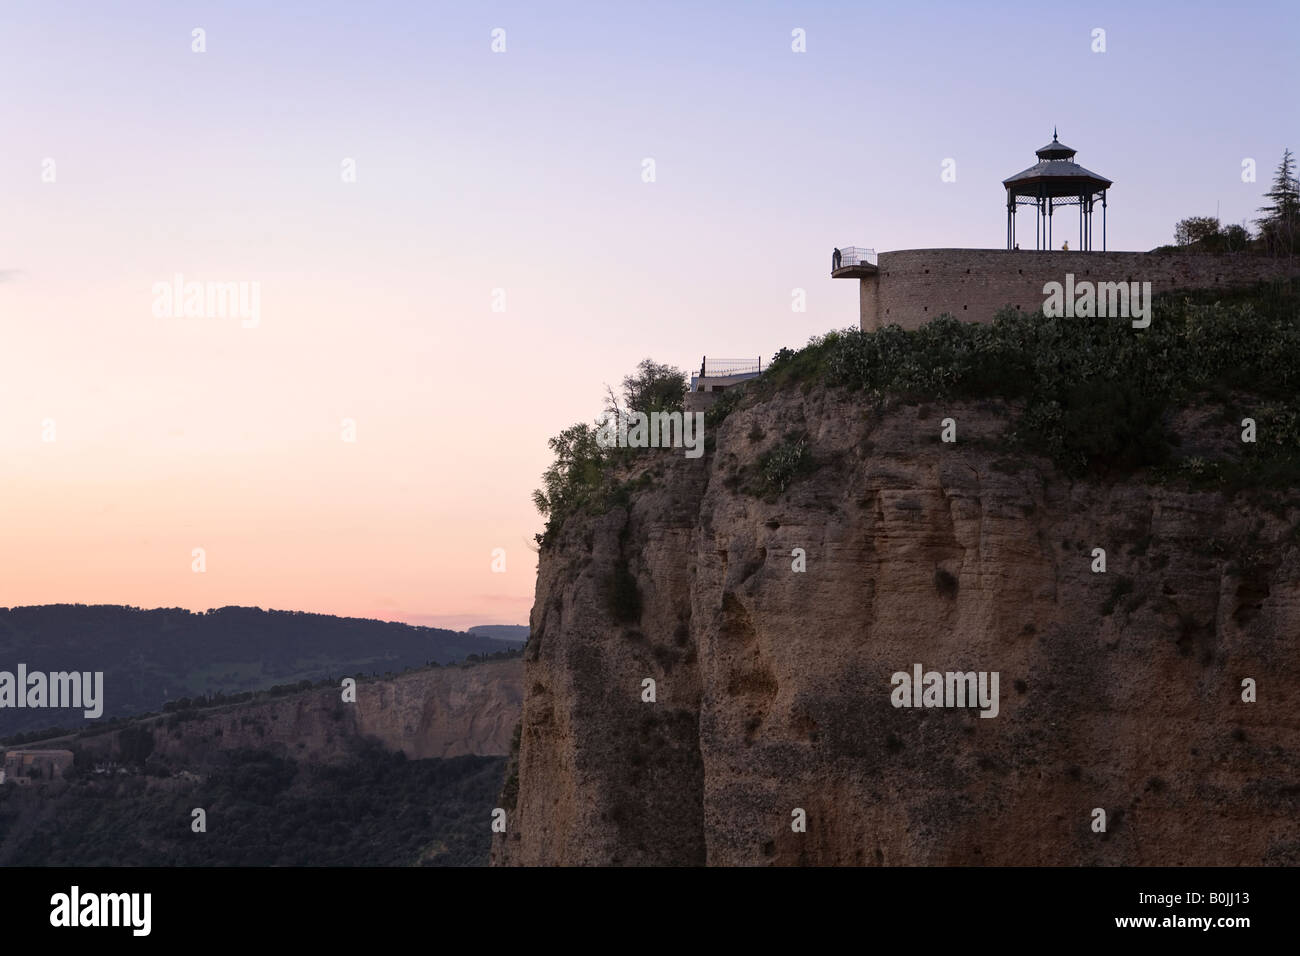 Ronda, Andalusia, Spain. Mirador at Blas Infante Promenade overlooking El Tajo gorge. Sunset Stock Photo